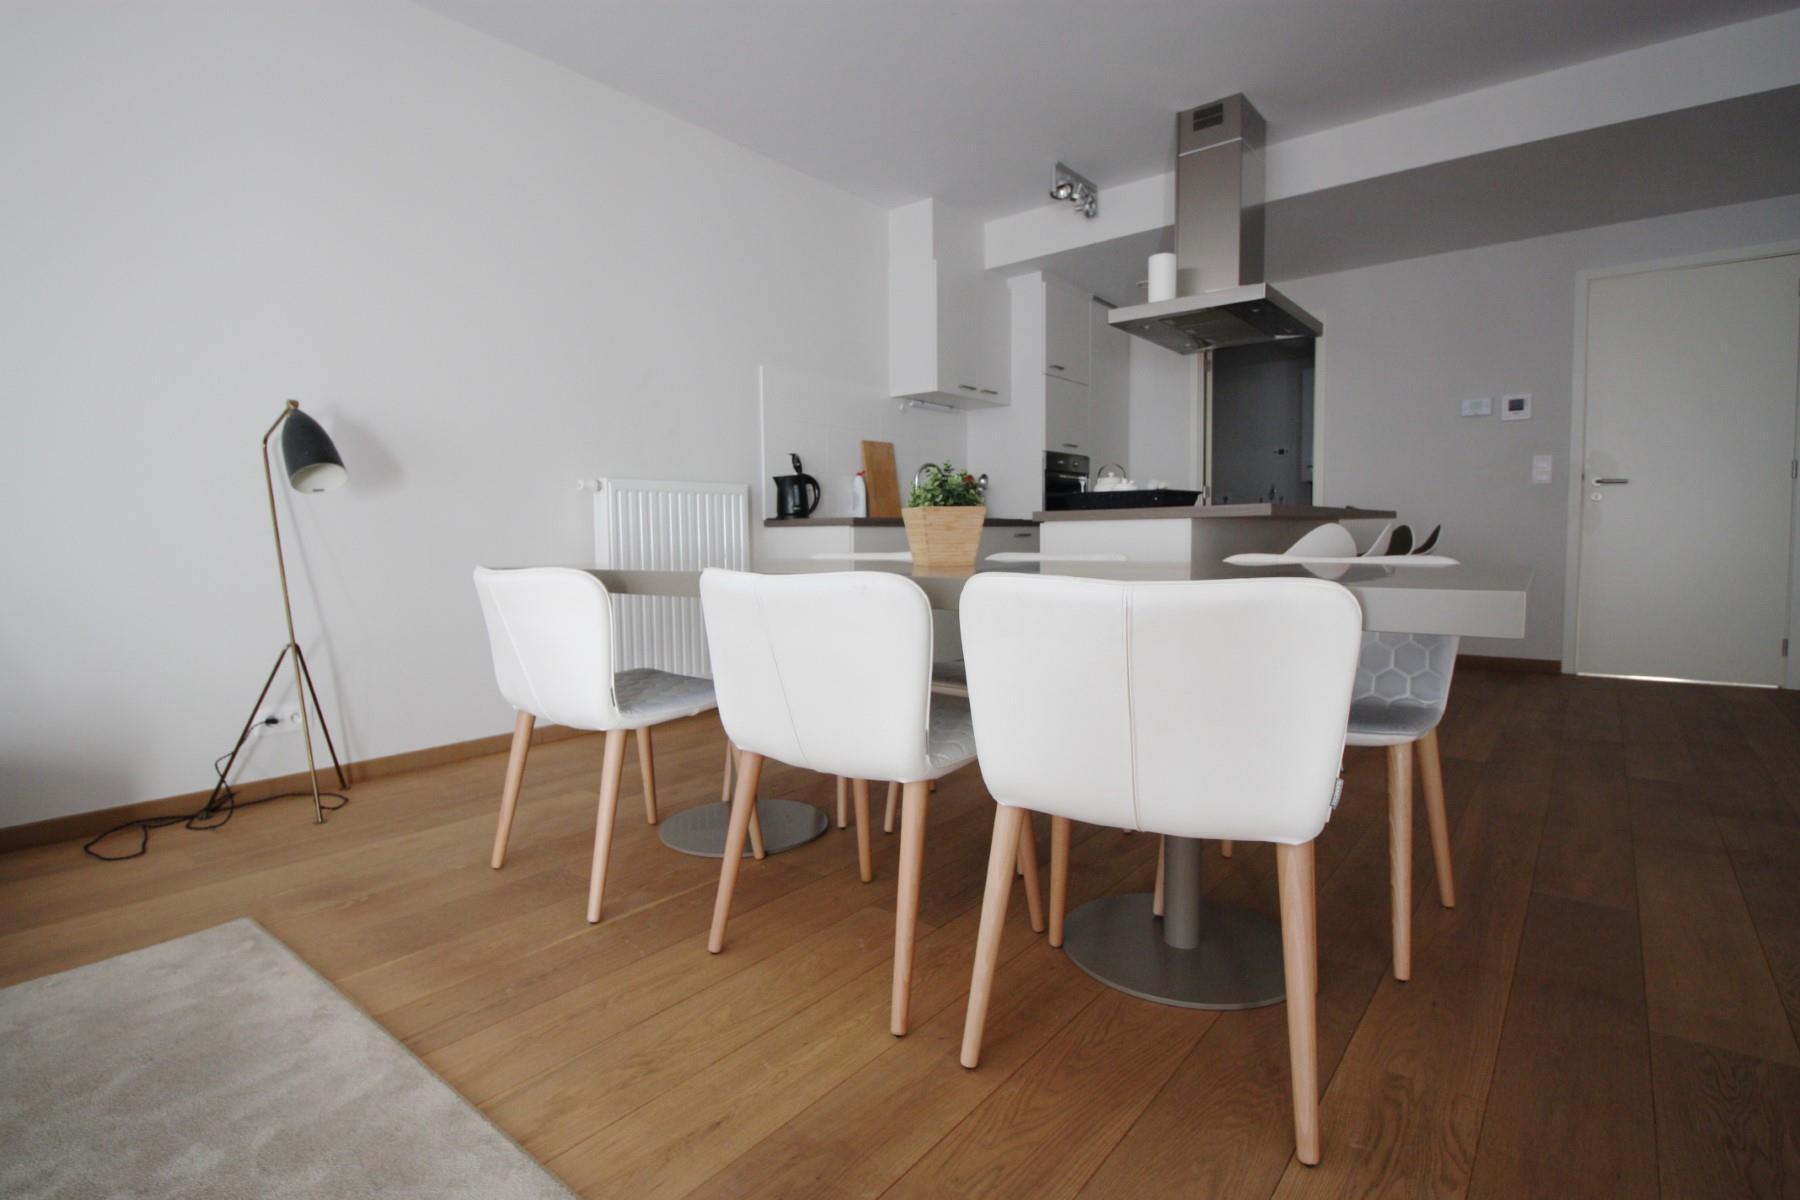 Flat - Etterbeek - #4527457-6